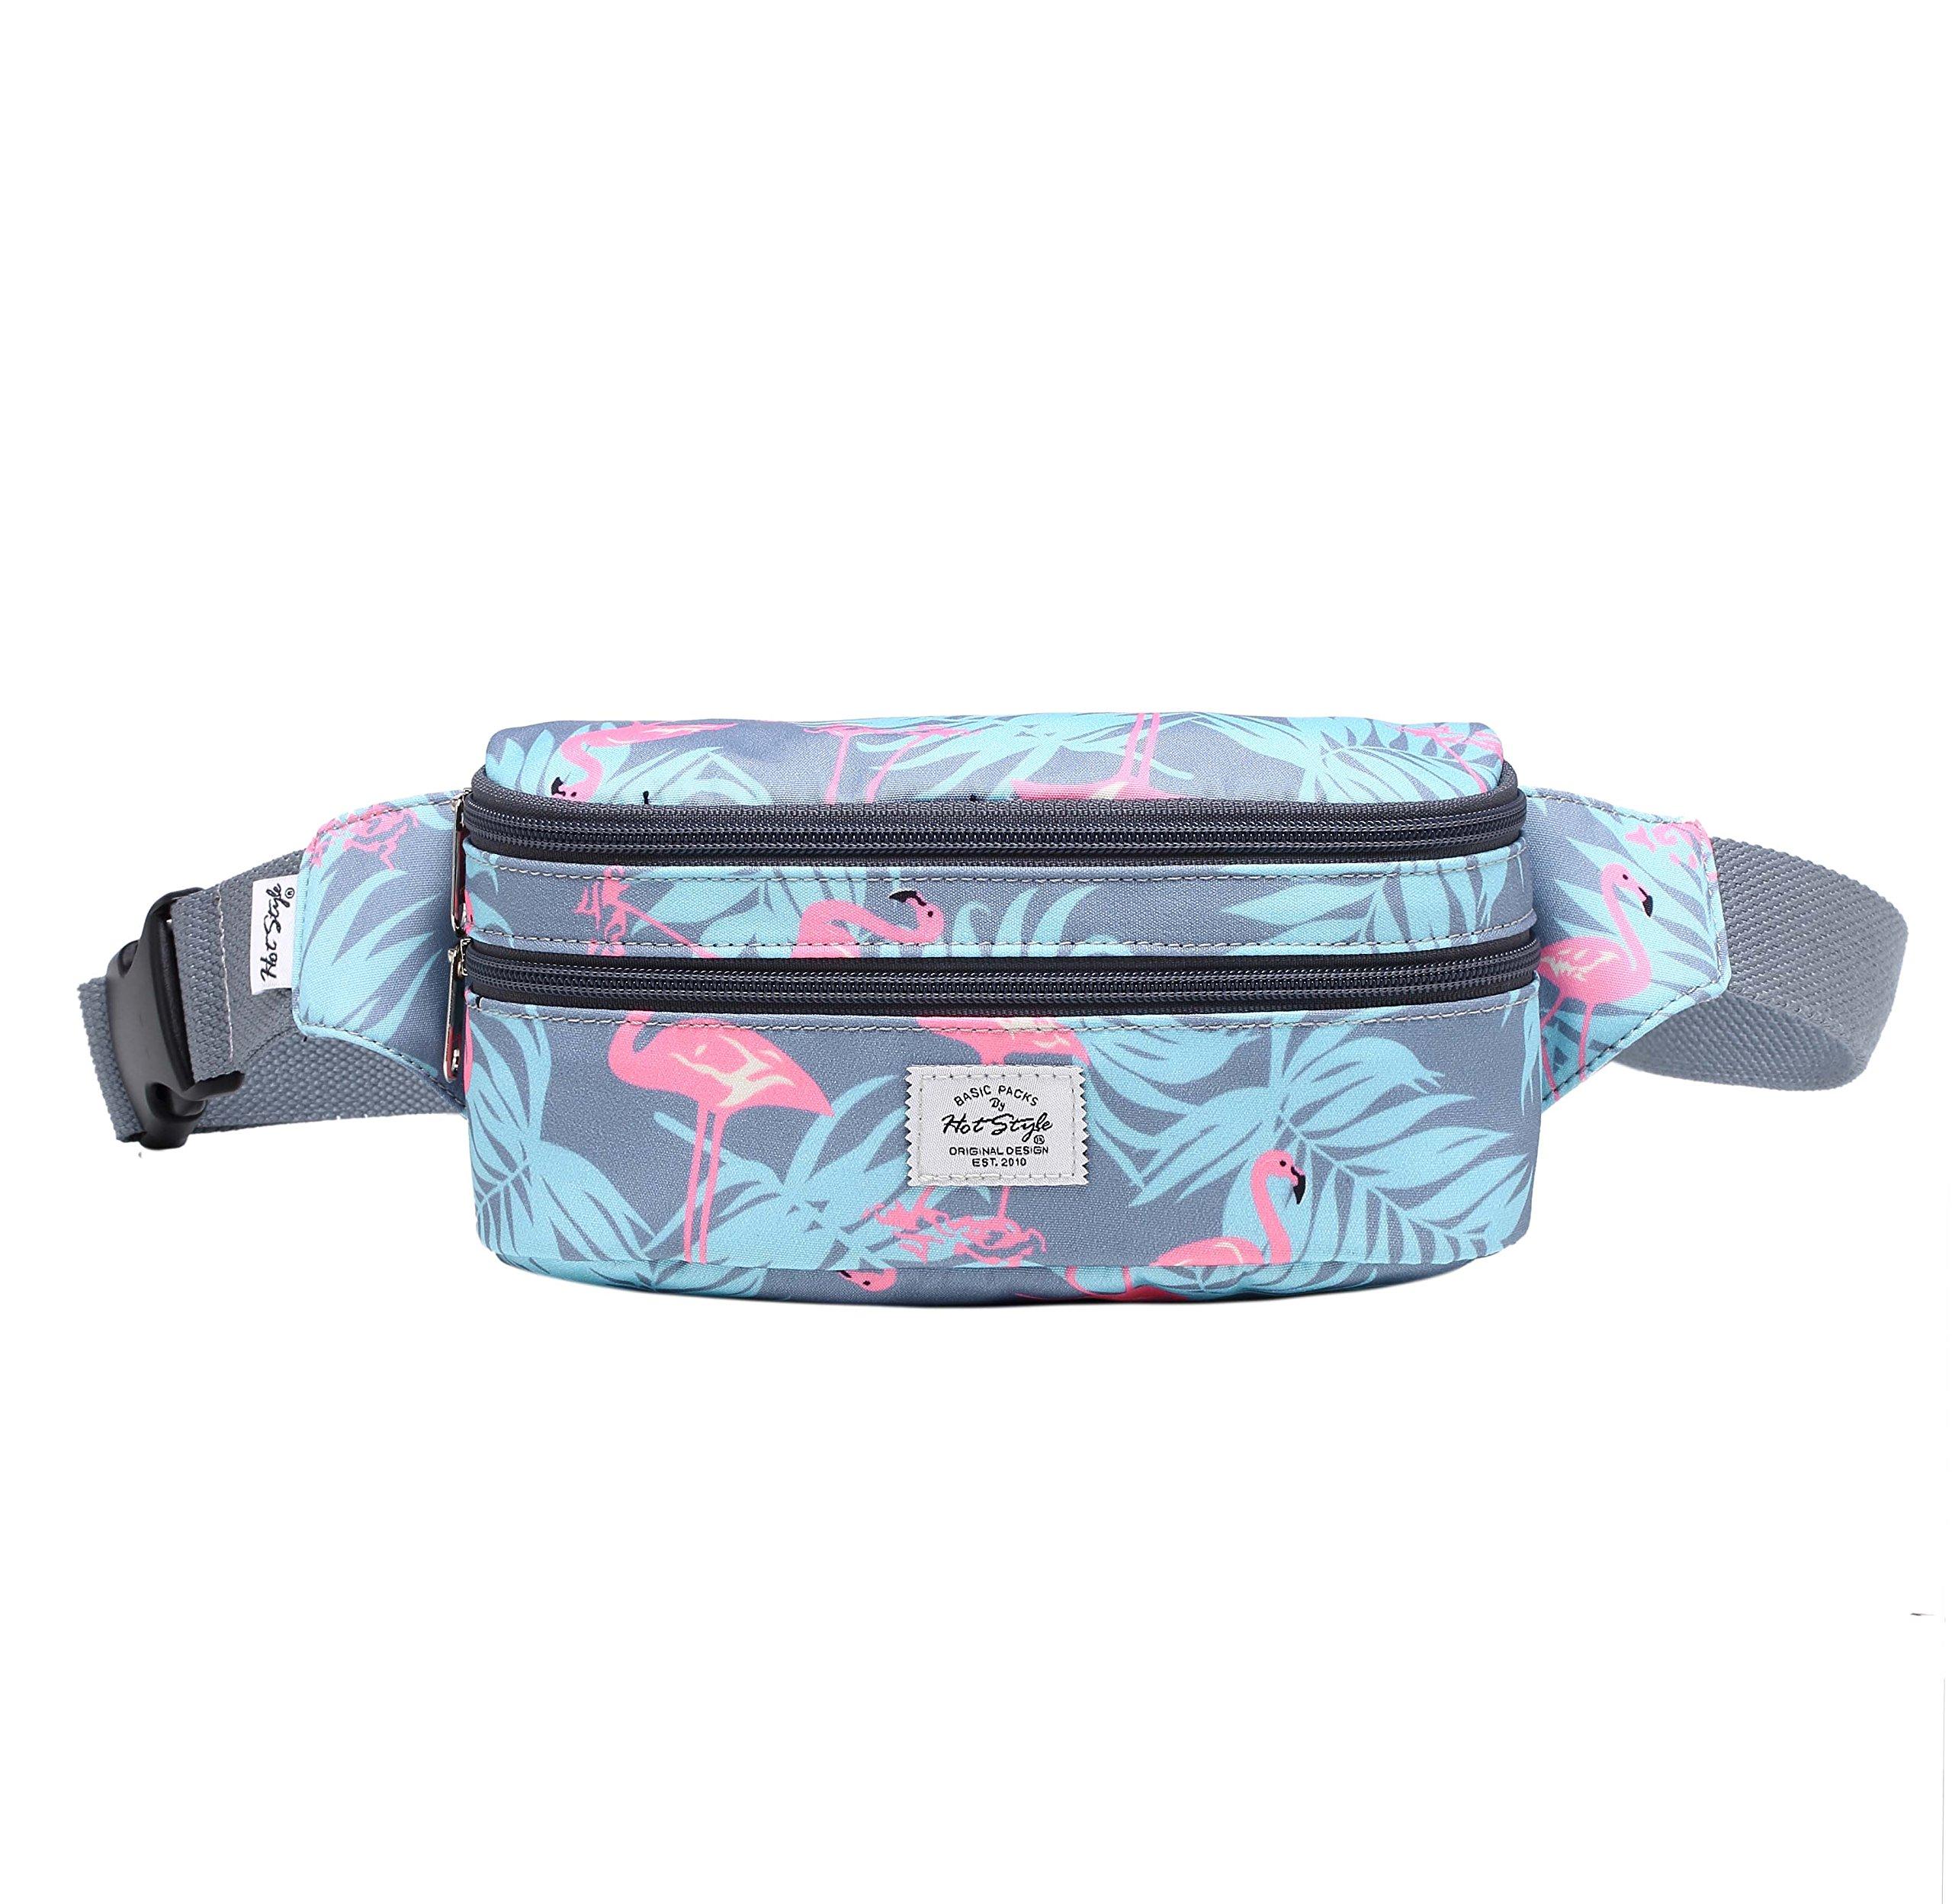 521s Fashion Waist Bag Cute Fanny Pack | 8.0''x2.5''x4.3'' | Millennial Flamingos by hotstyle